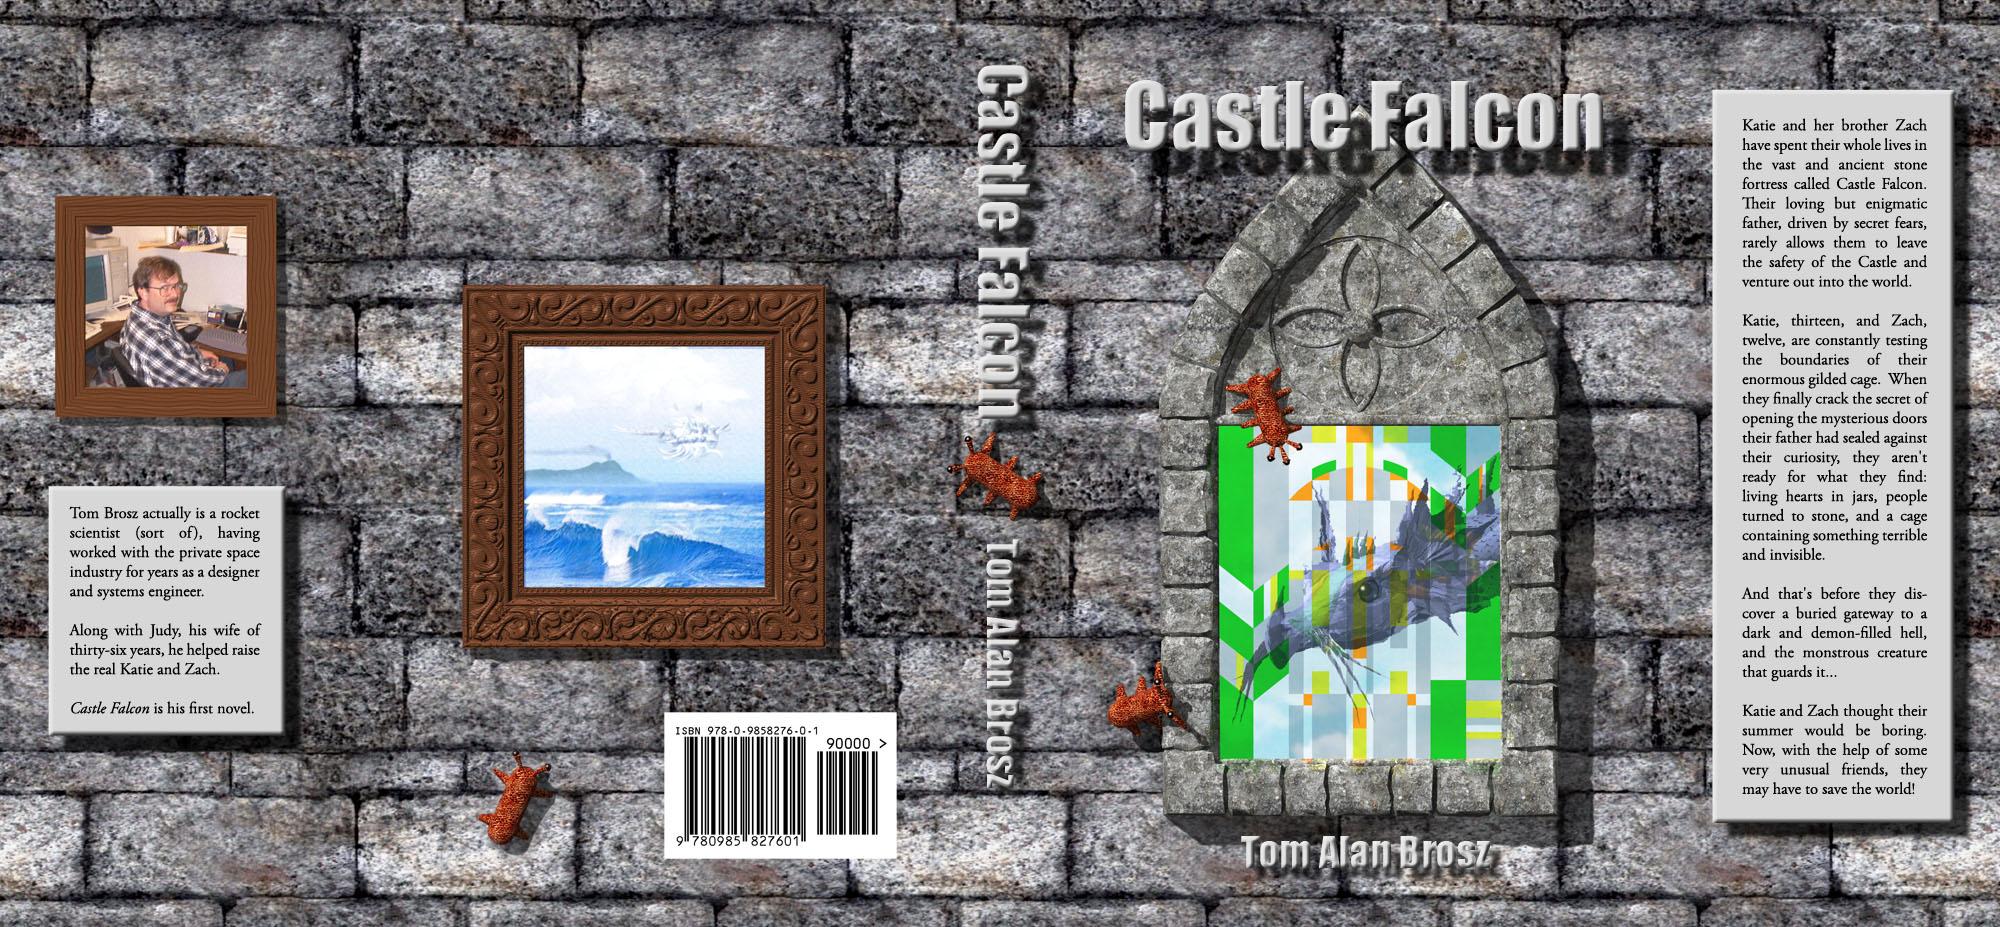 Castle Falcon Cover, dust jacket by Tom Alan Brosz